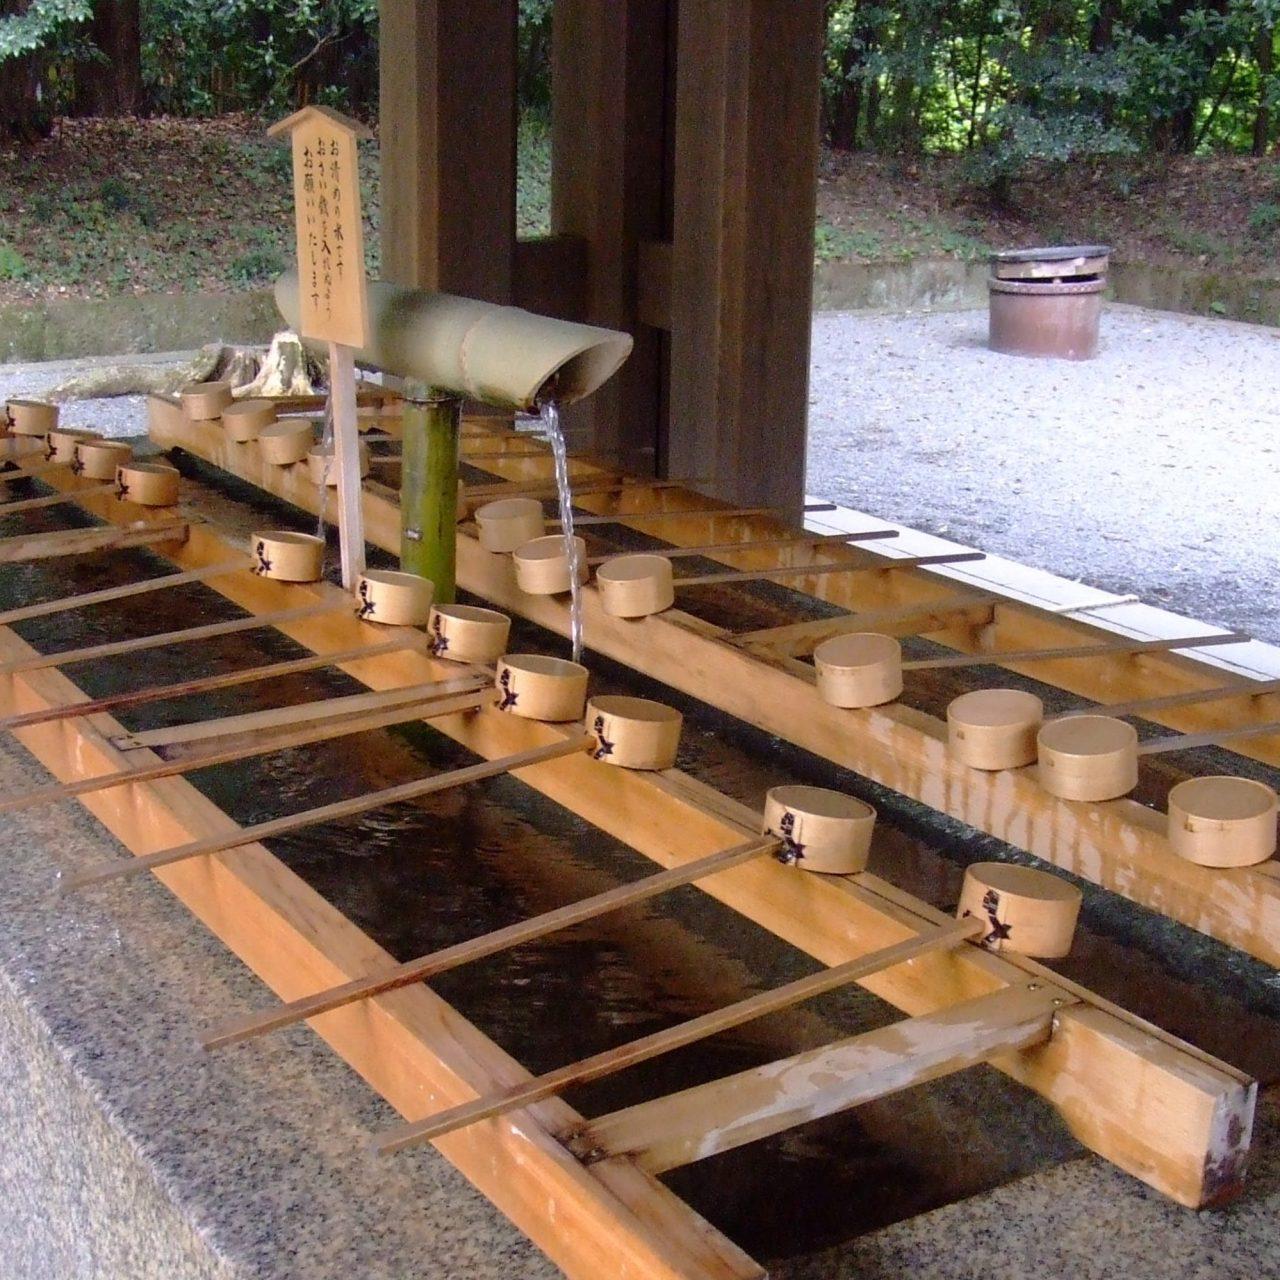 How Is This Shintō Shrine Changing Its Purification Rituals To Combat Coronavirus?